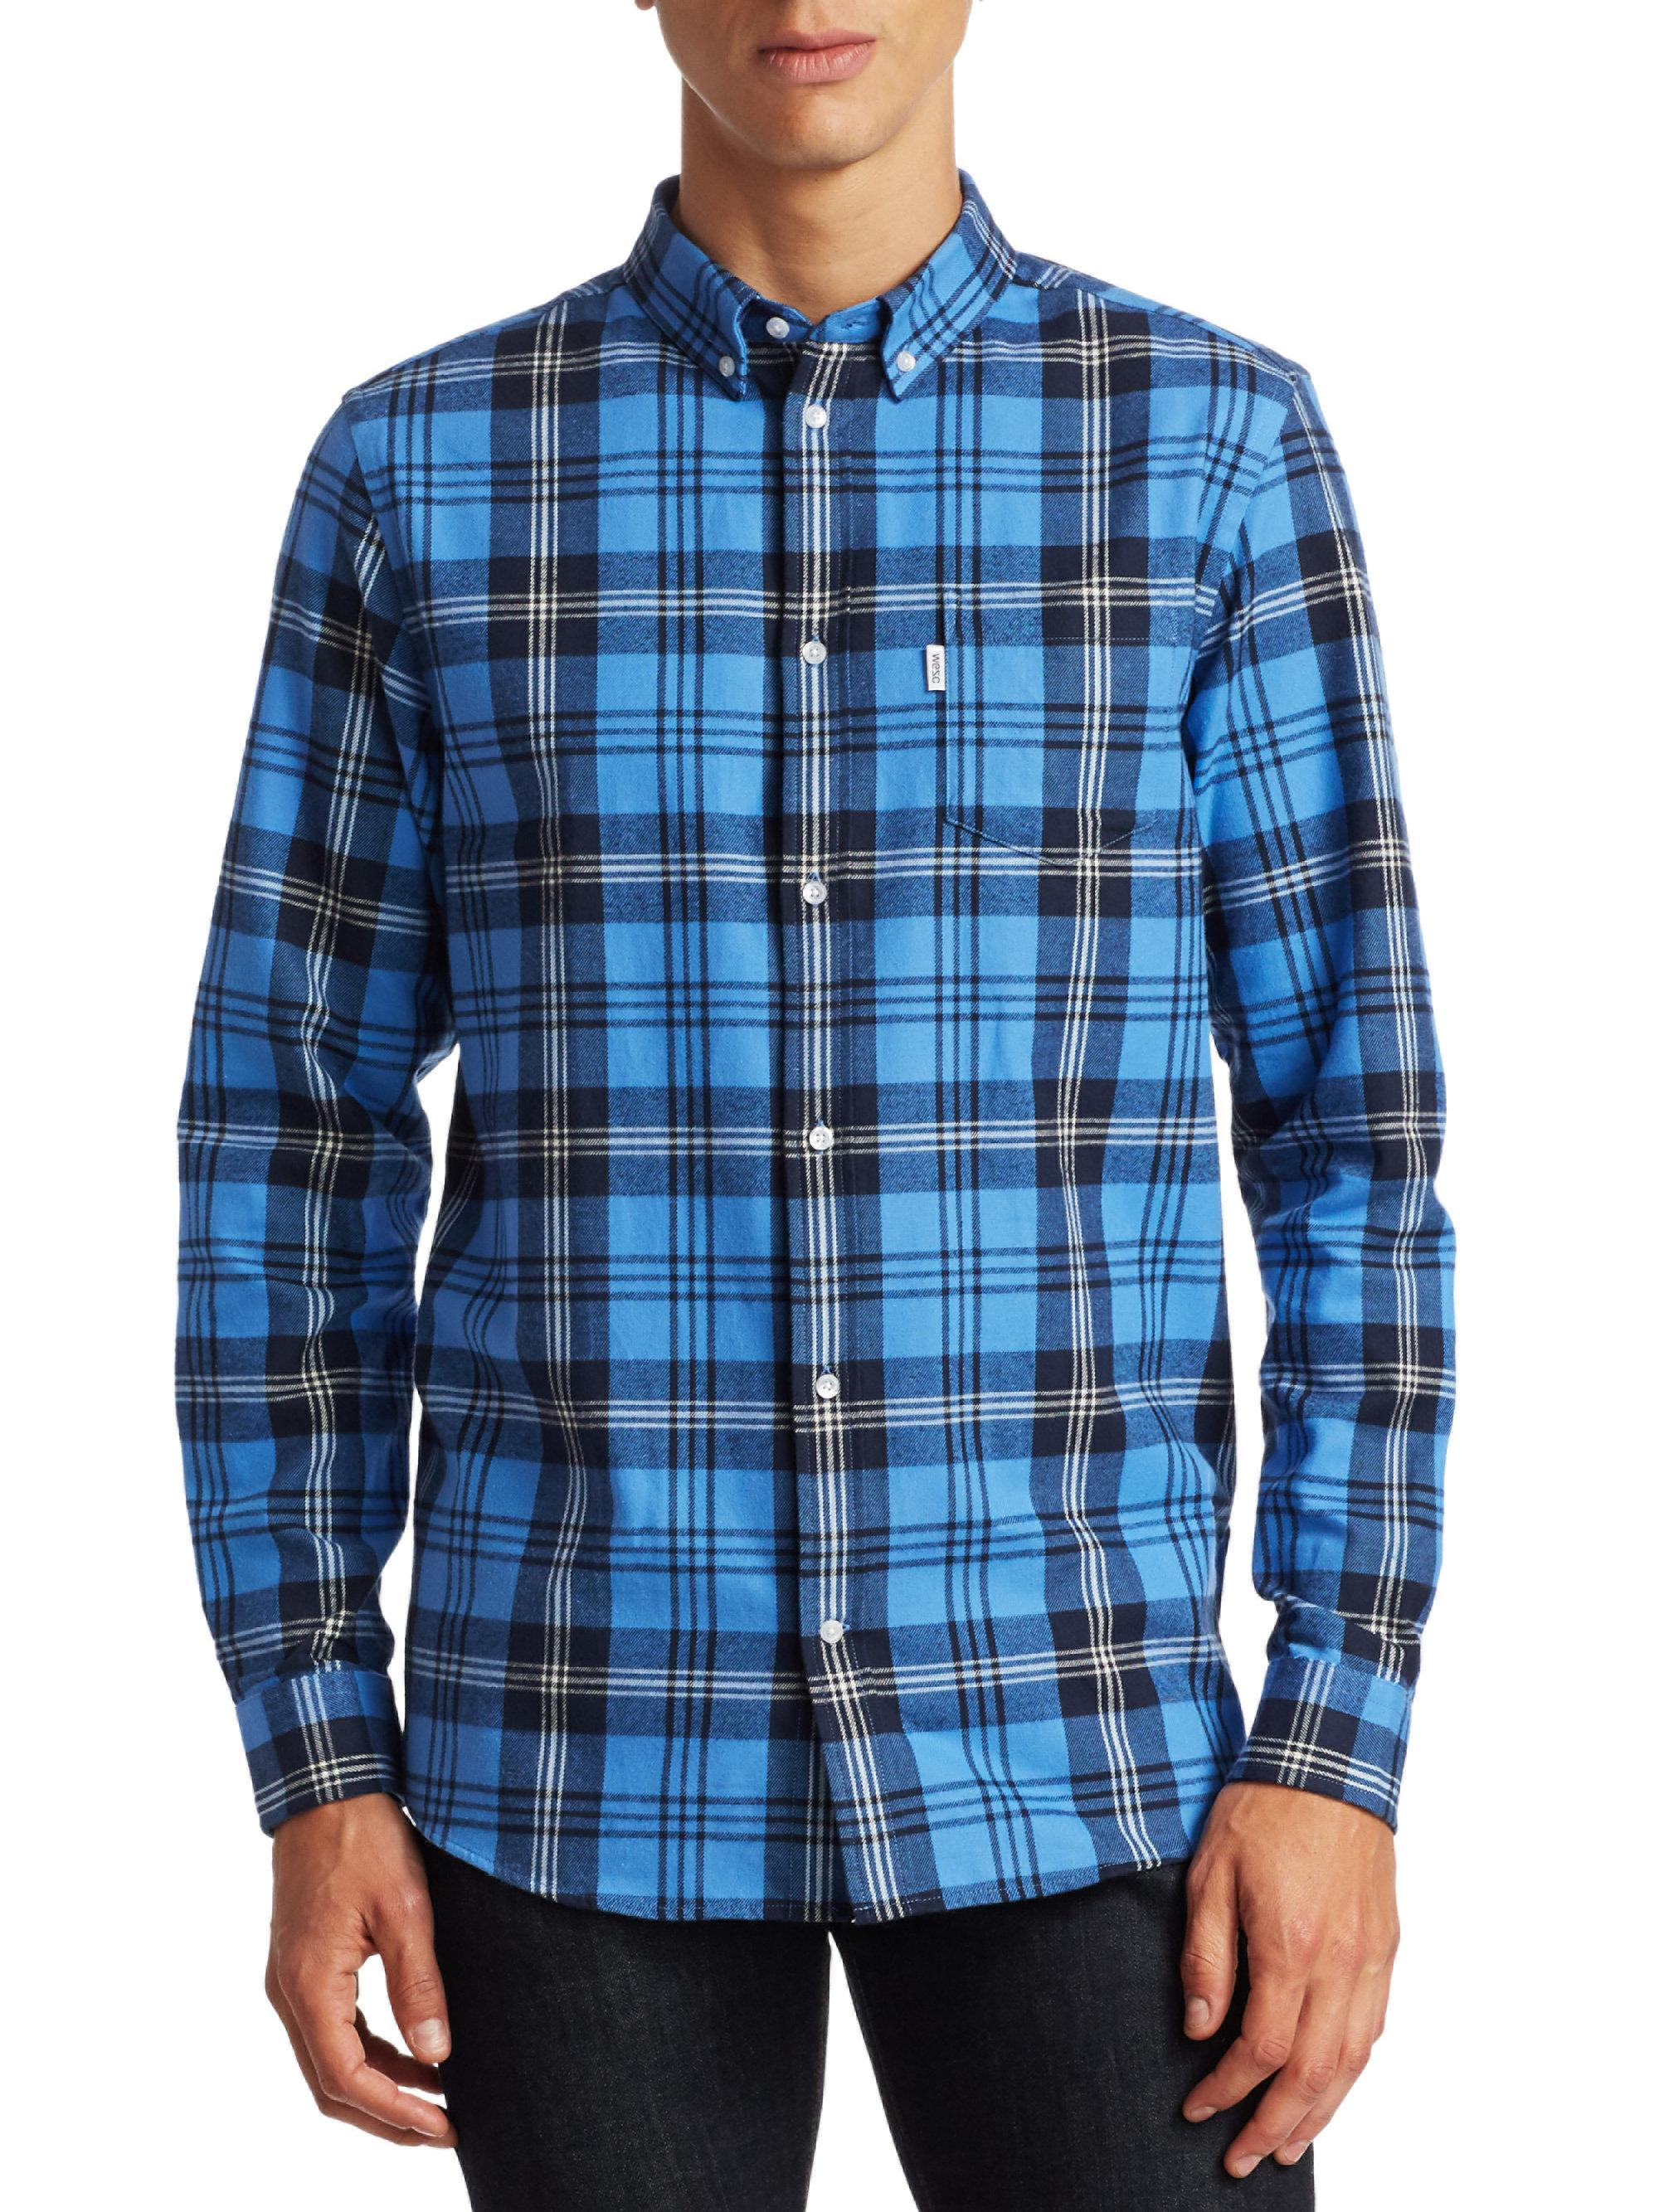 16bd0a1424e Lyst - Wesc Vernon Plaid Regular-fit Cotton Button-down Shirt in ...